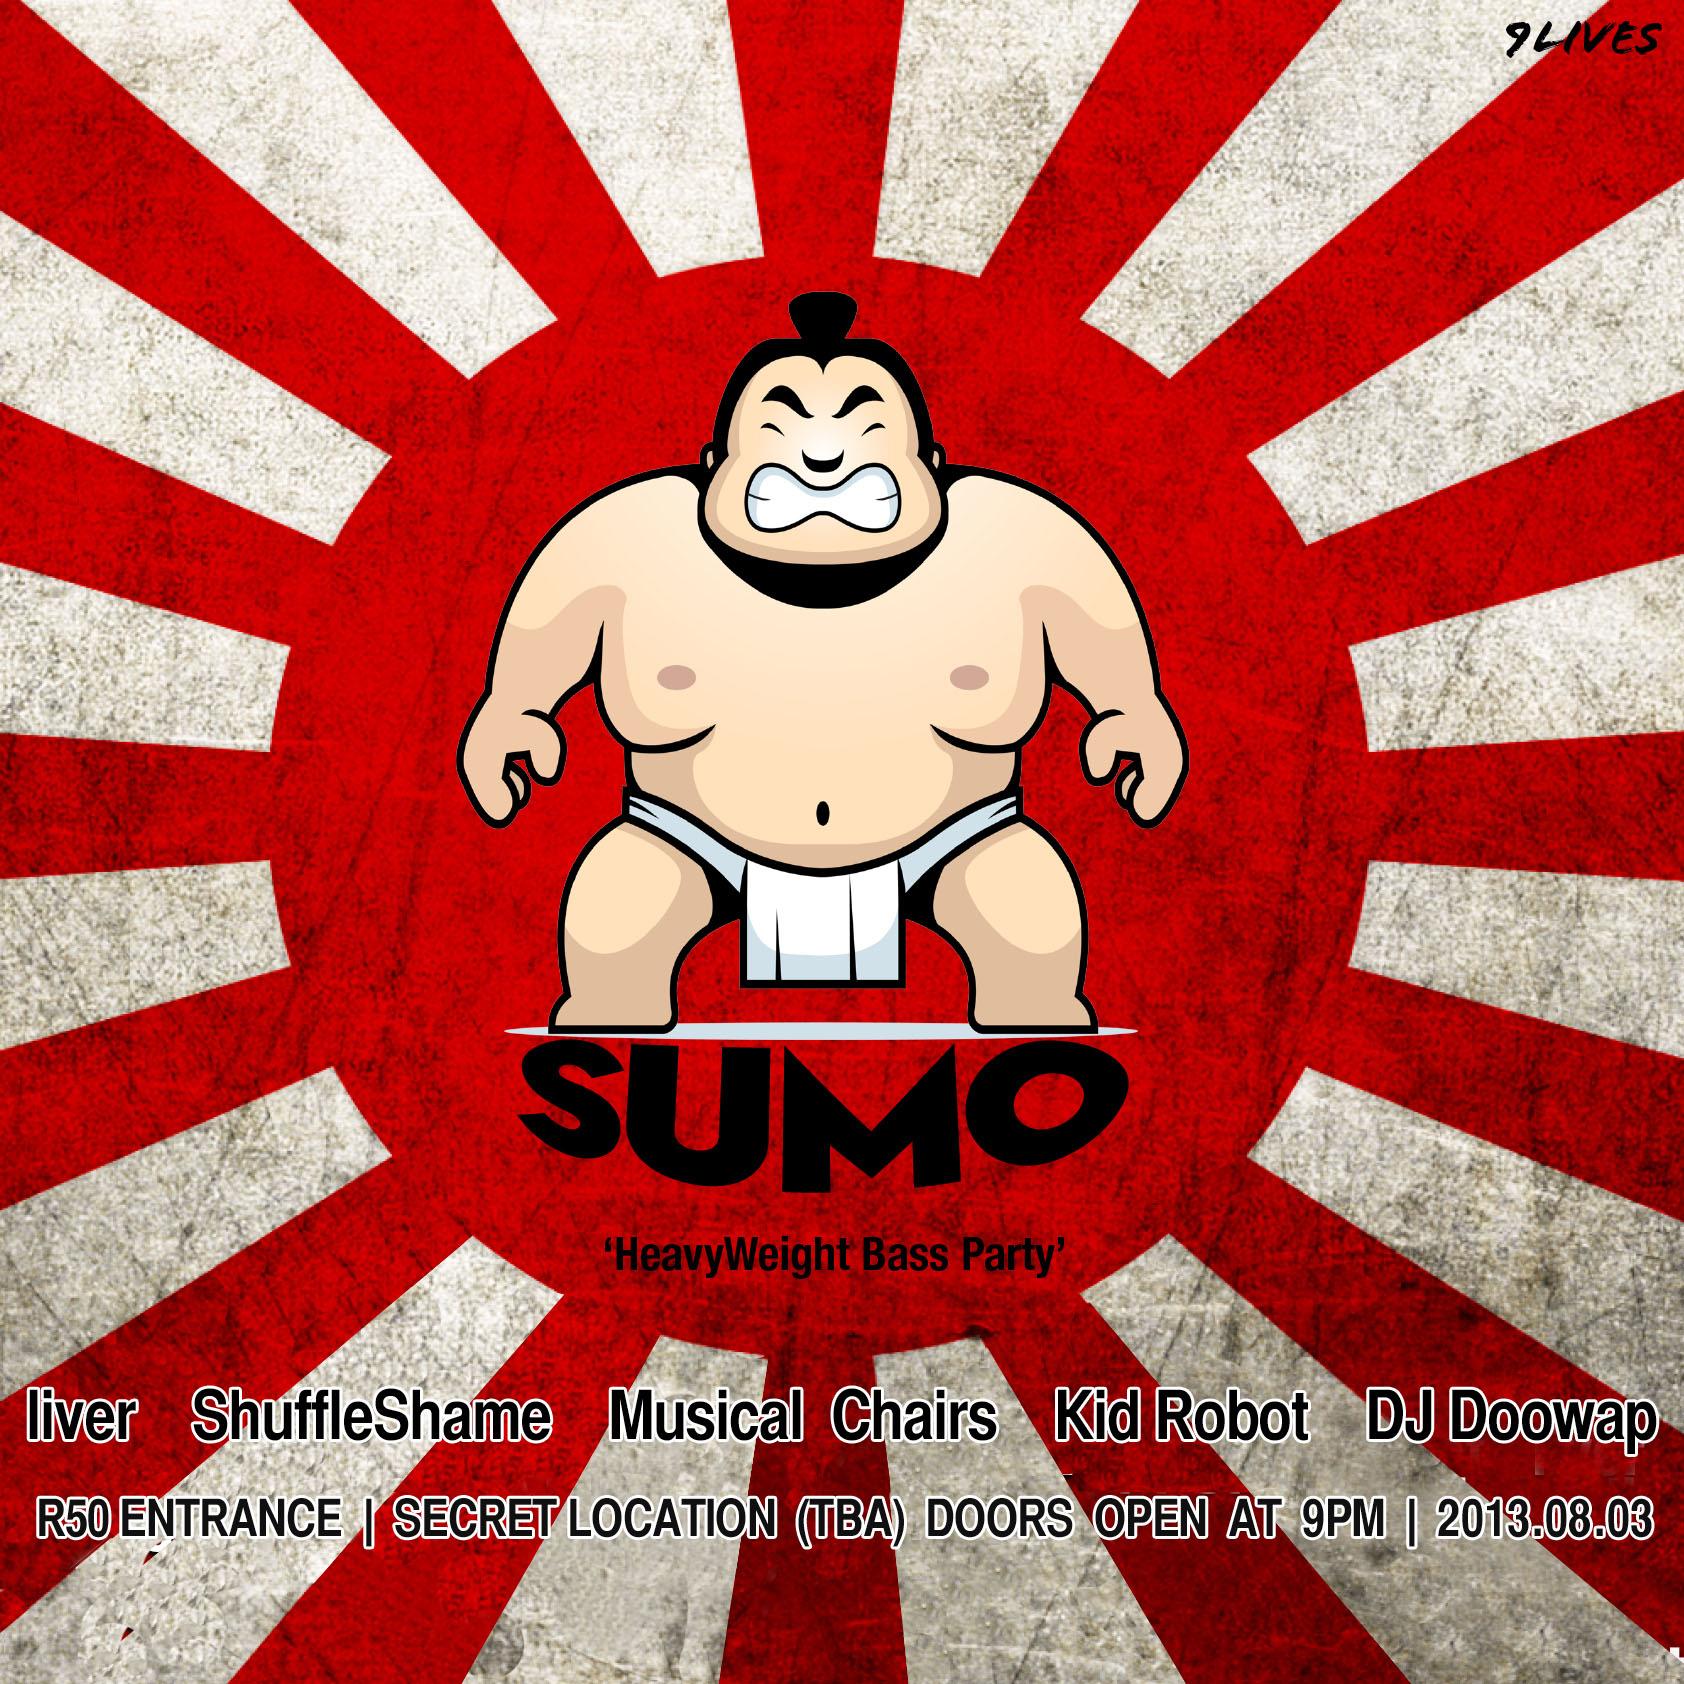 Sumo poster_v2 (1)